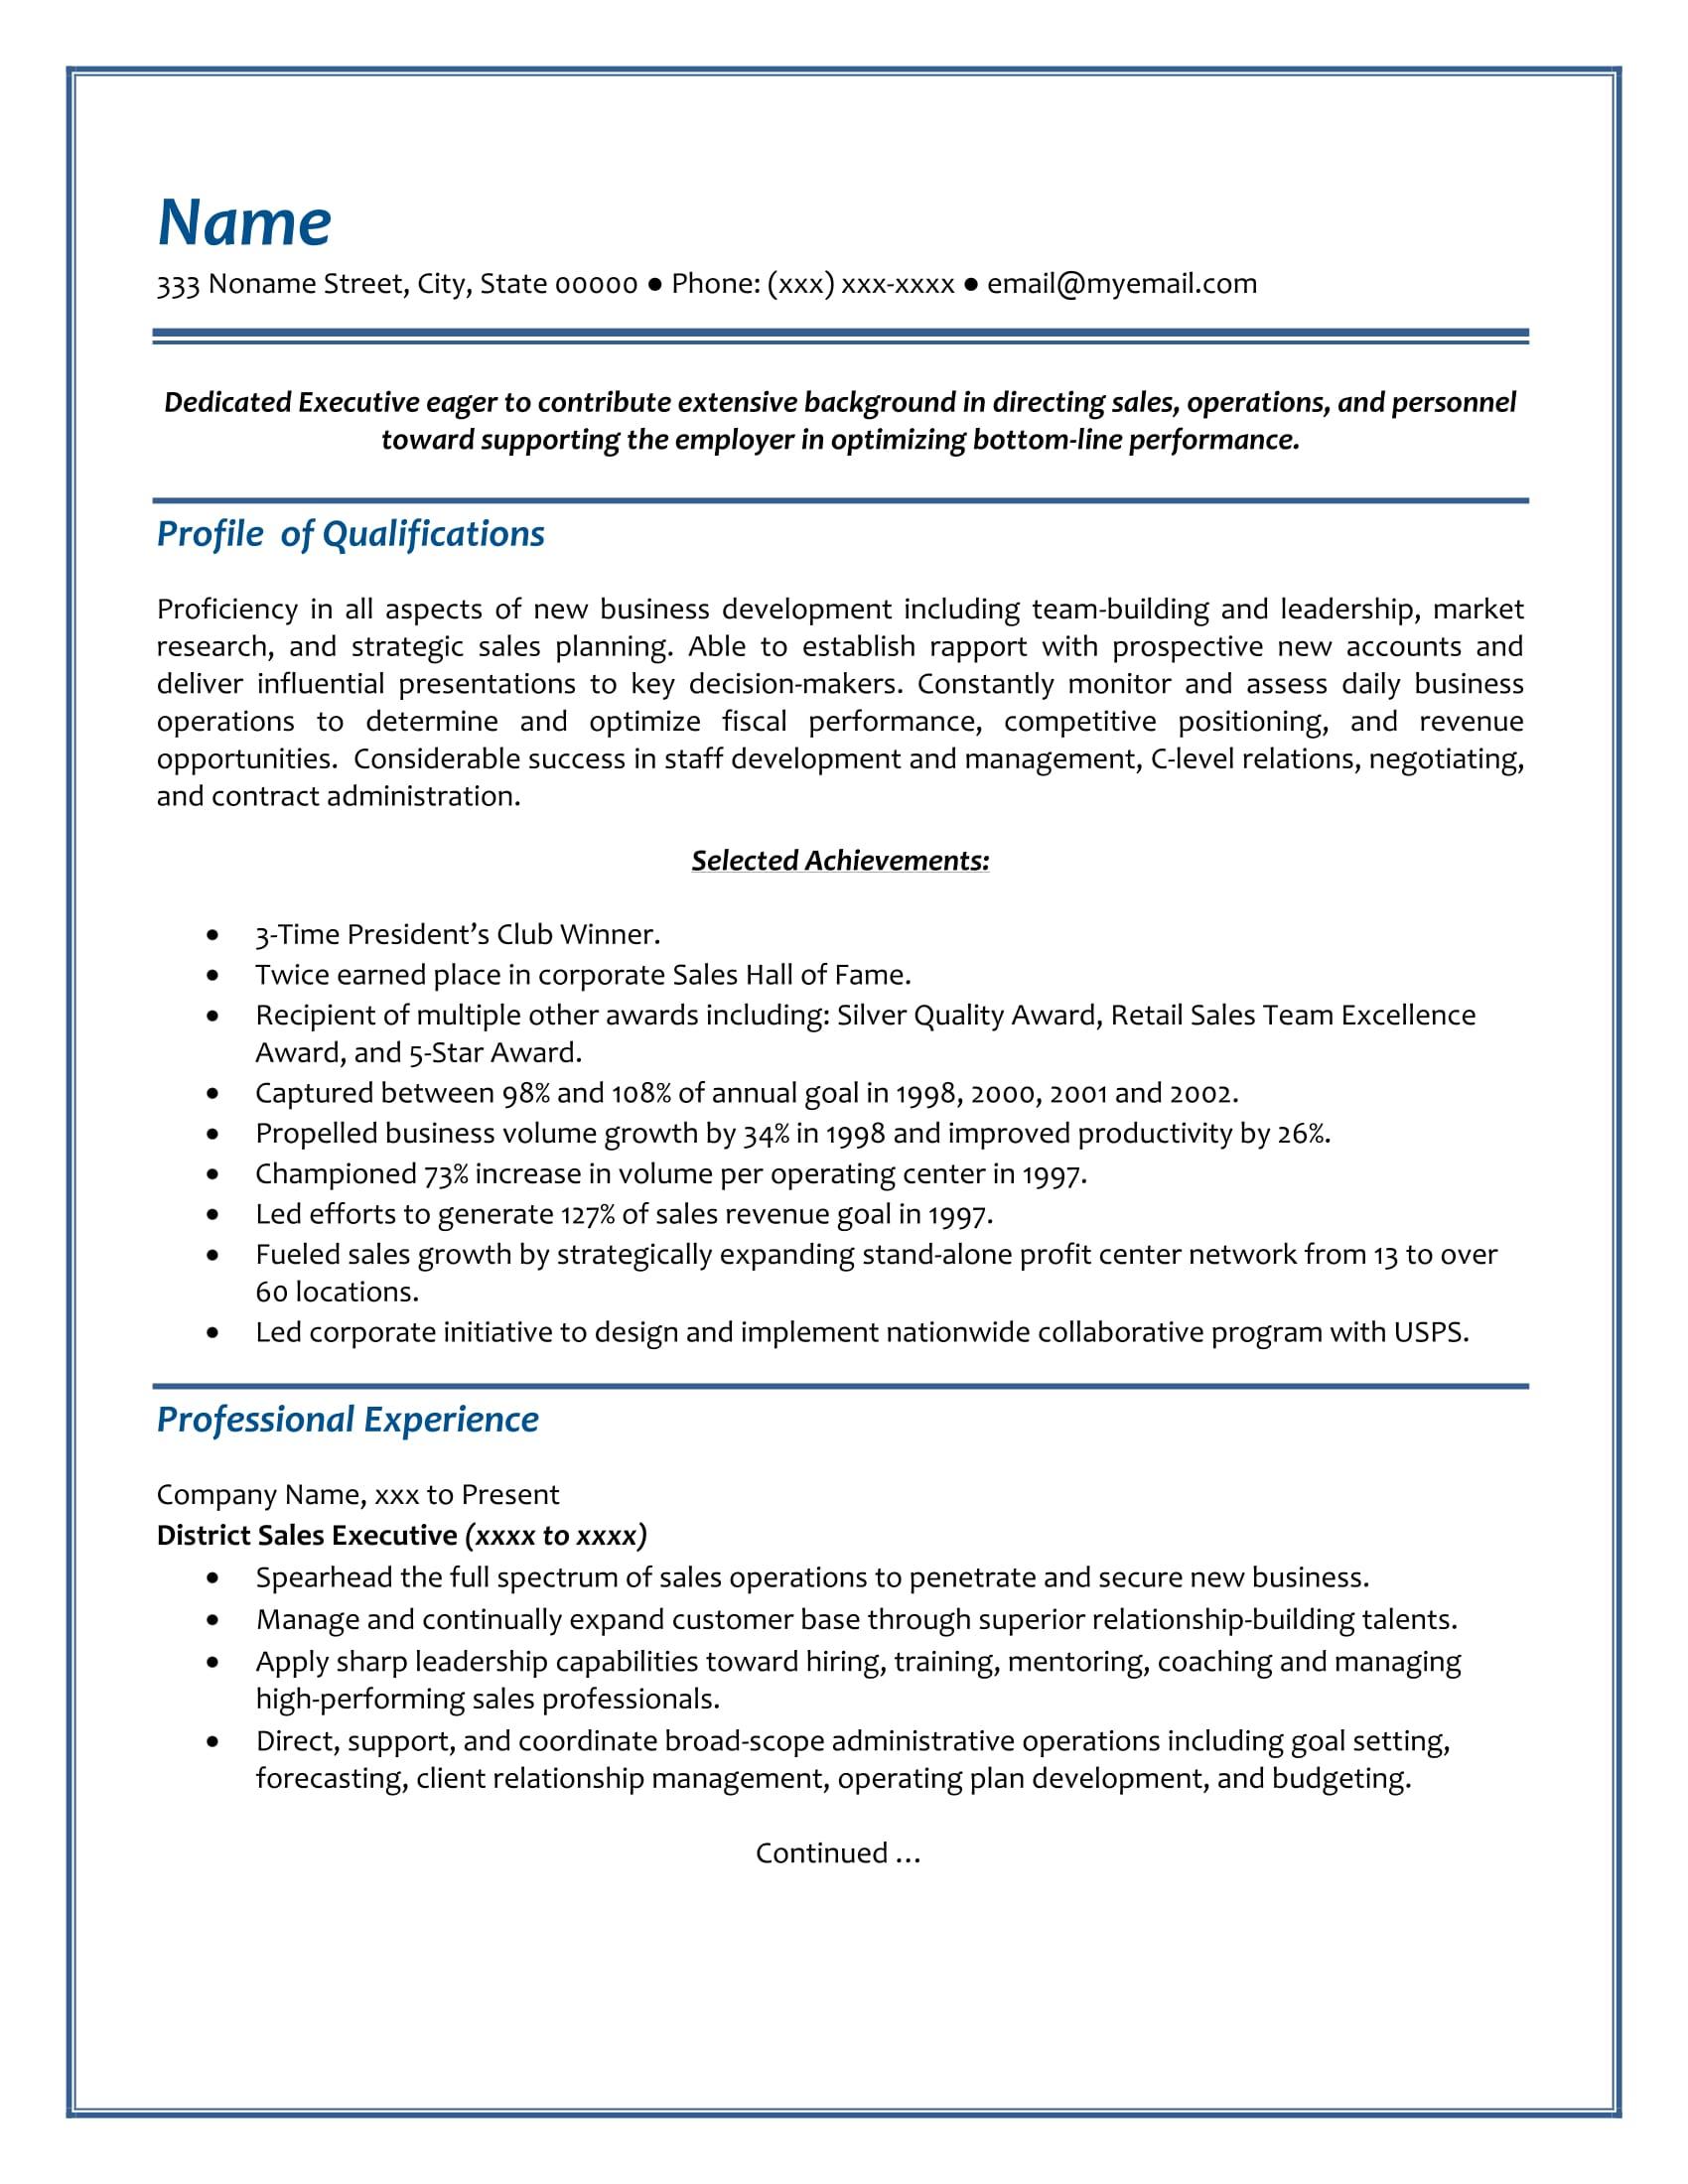 Free Resume Samples | Resume Writing Group